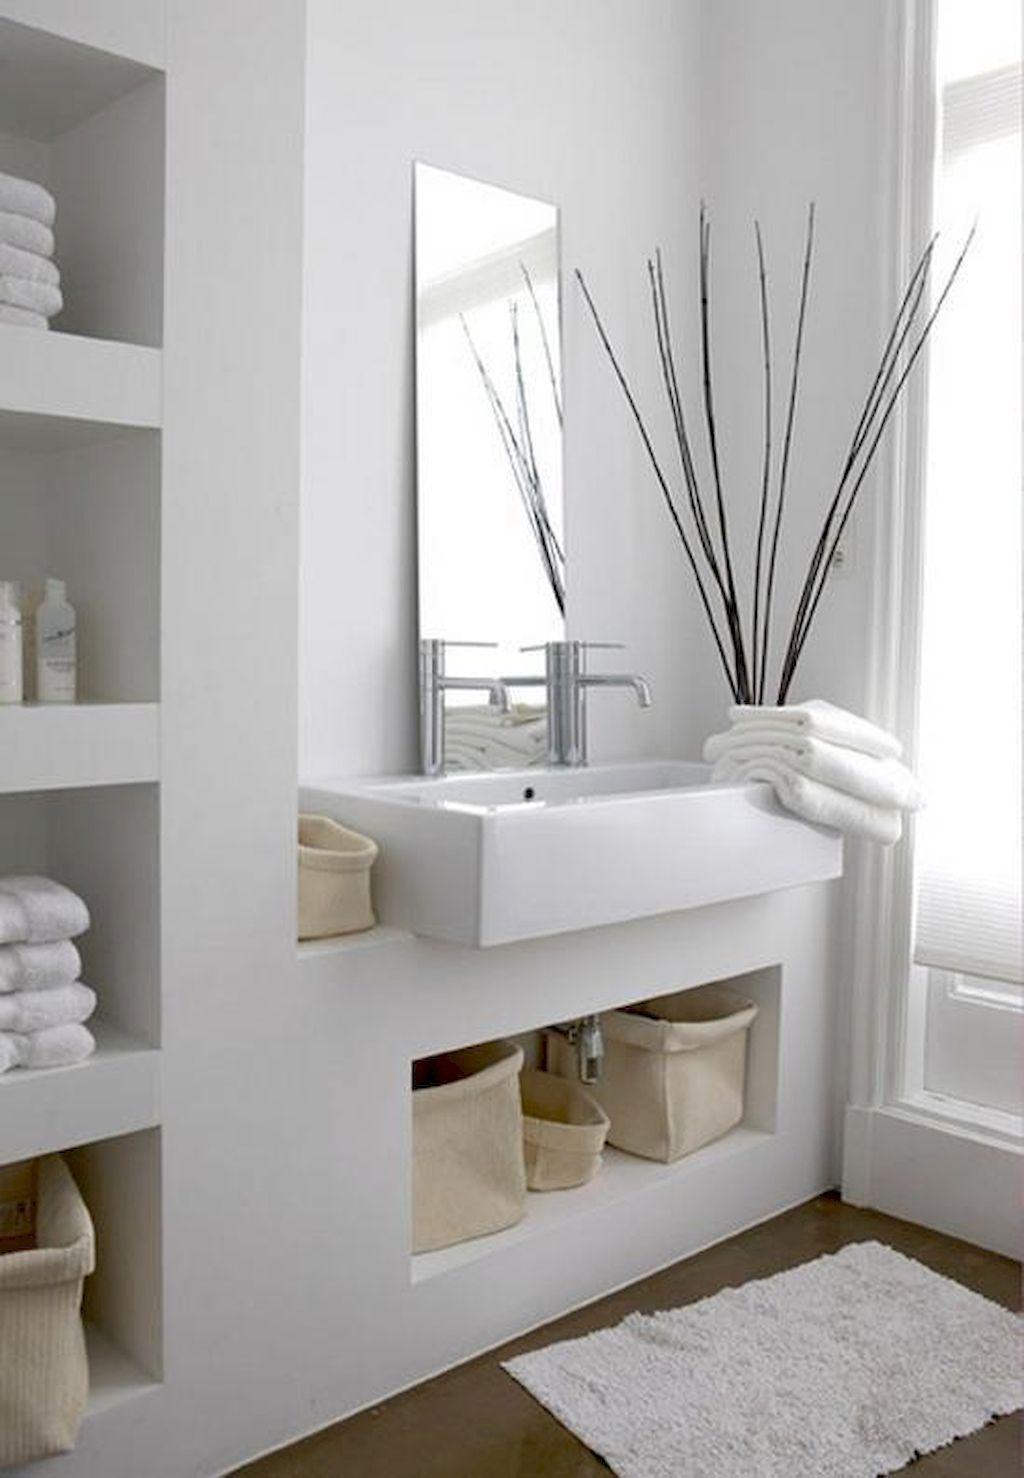 Amazing Man Cave Bathroom Designs Picture Collection - Bathroom ...